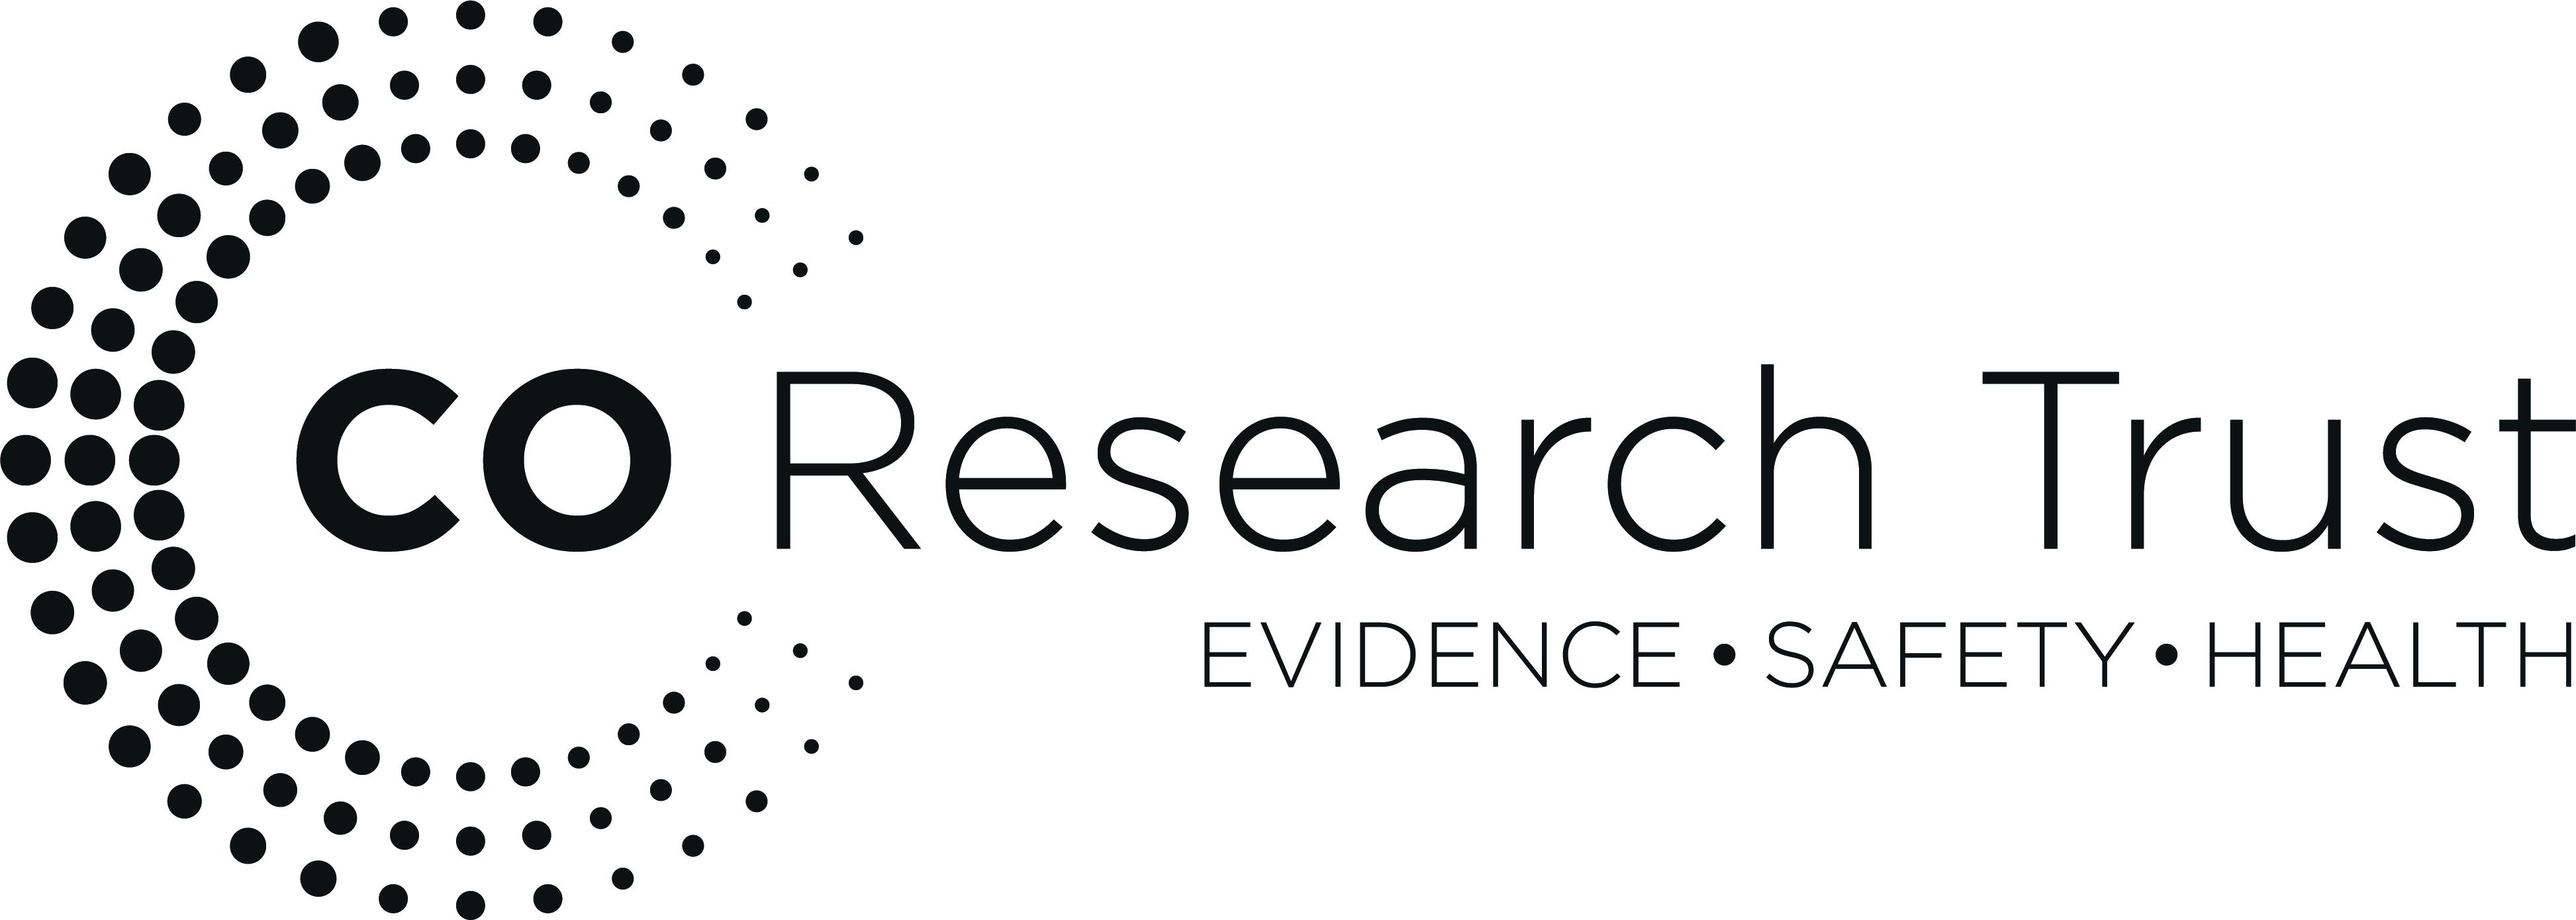 CO Research Trust logo